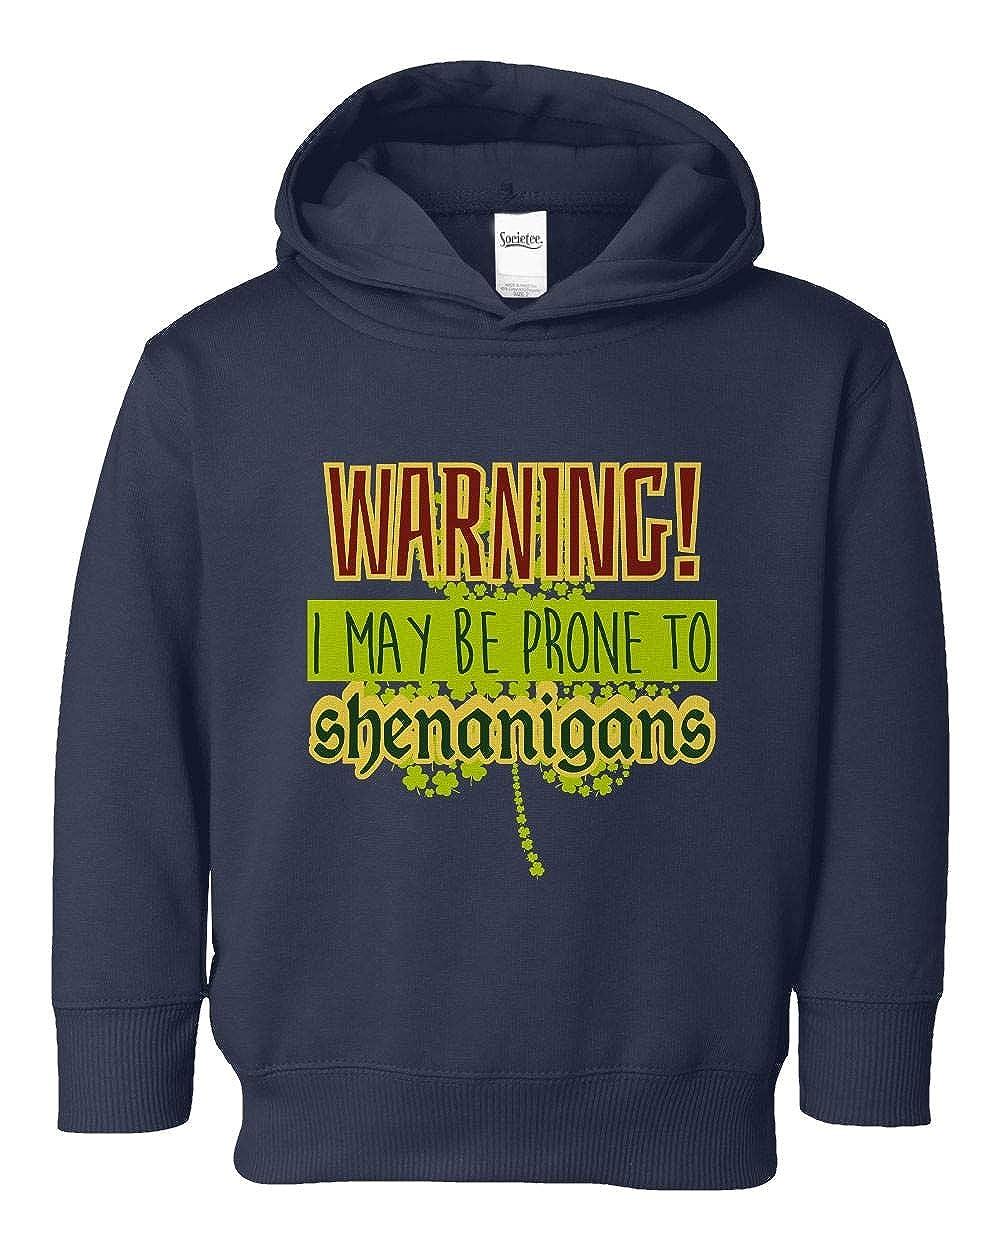 Societee May Be Prone to Shenanigans Girls Boys Toddler Hooded Sweatshirt